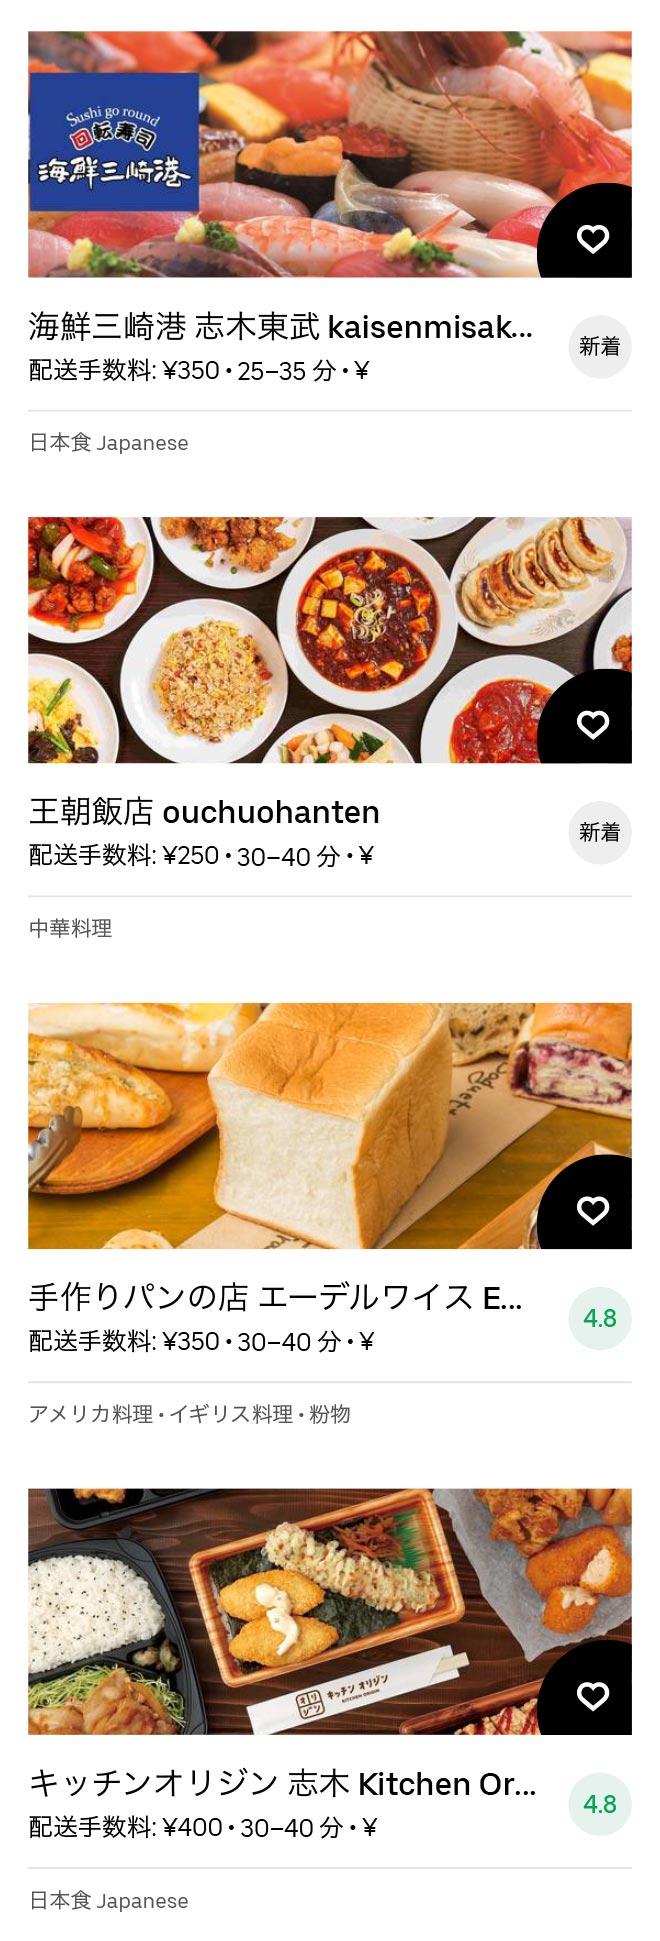 Niiza menu 2011 12